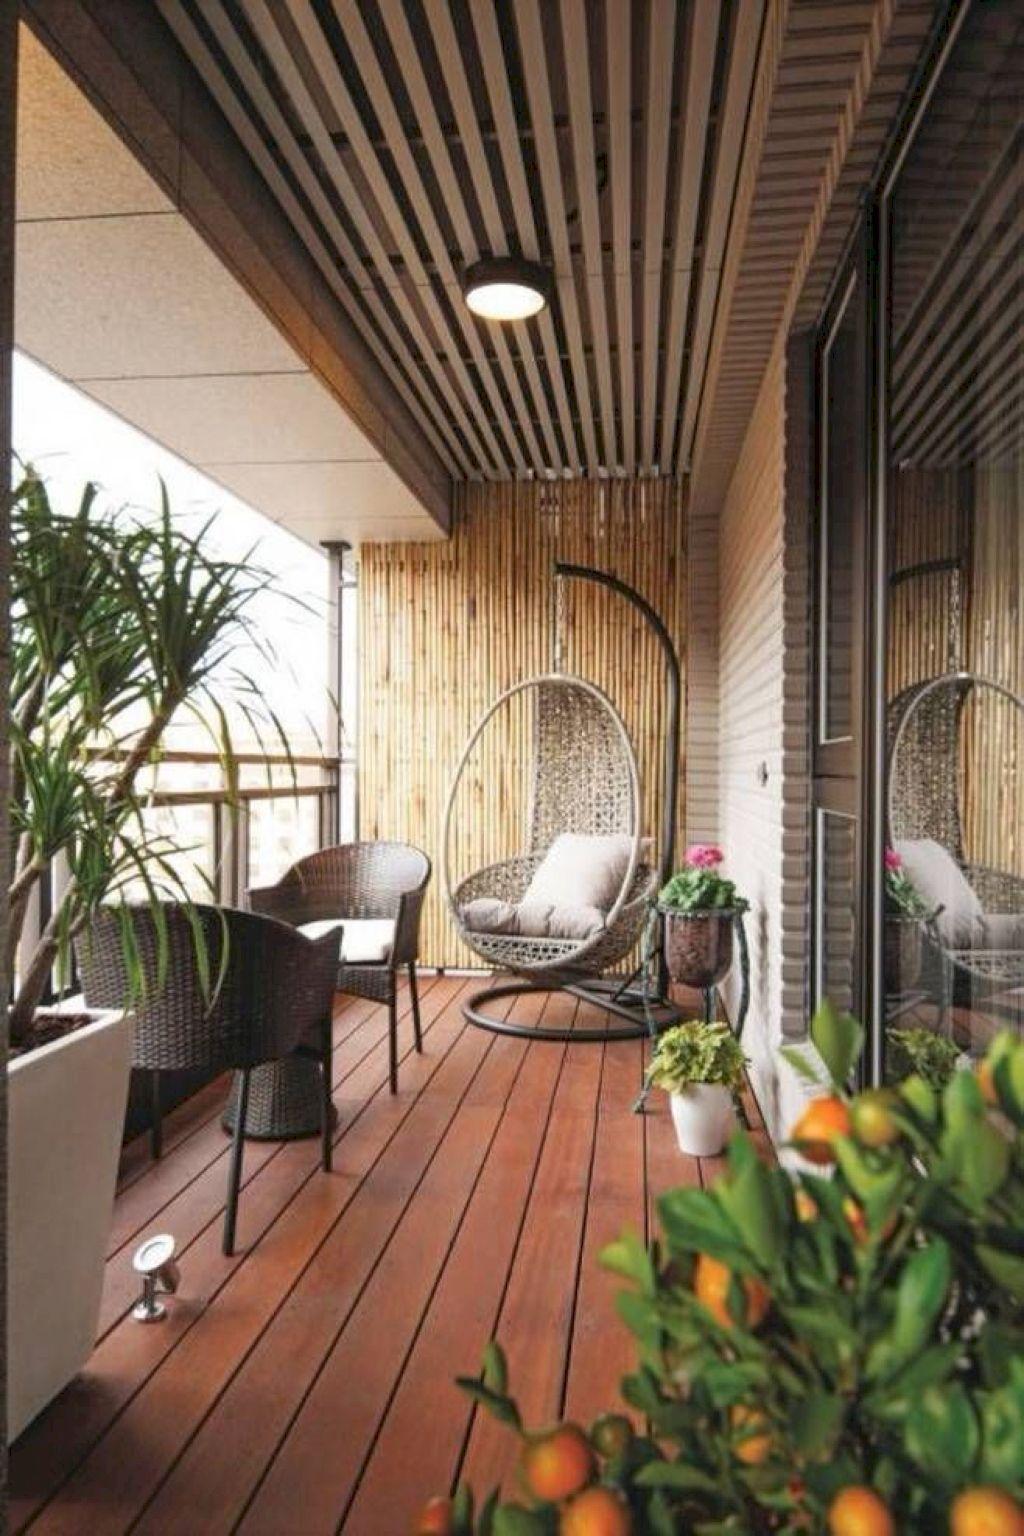 33 Apartment Balcony Garden Ideas That You Will Love: 33 Small Apartment Balcony Decorating Ideas